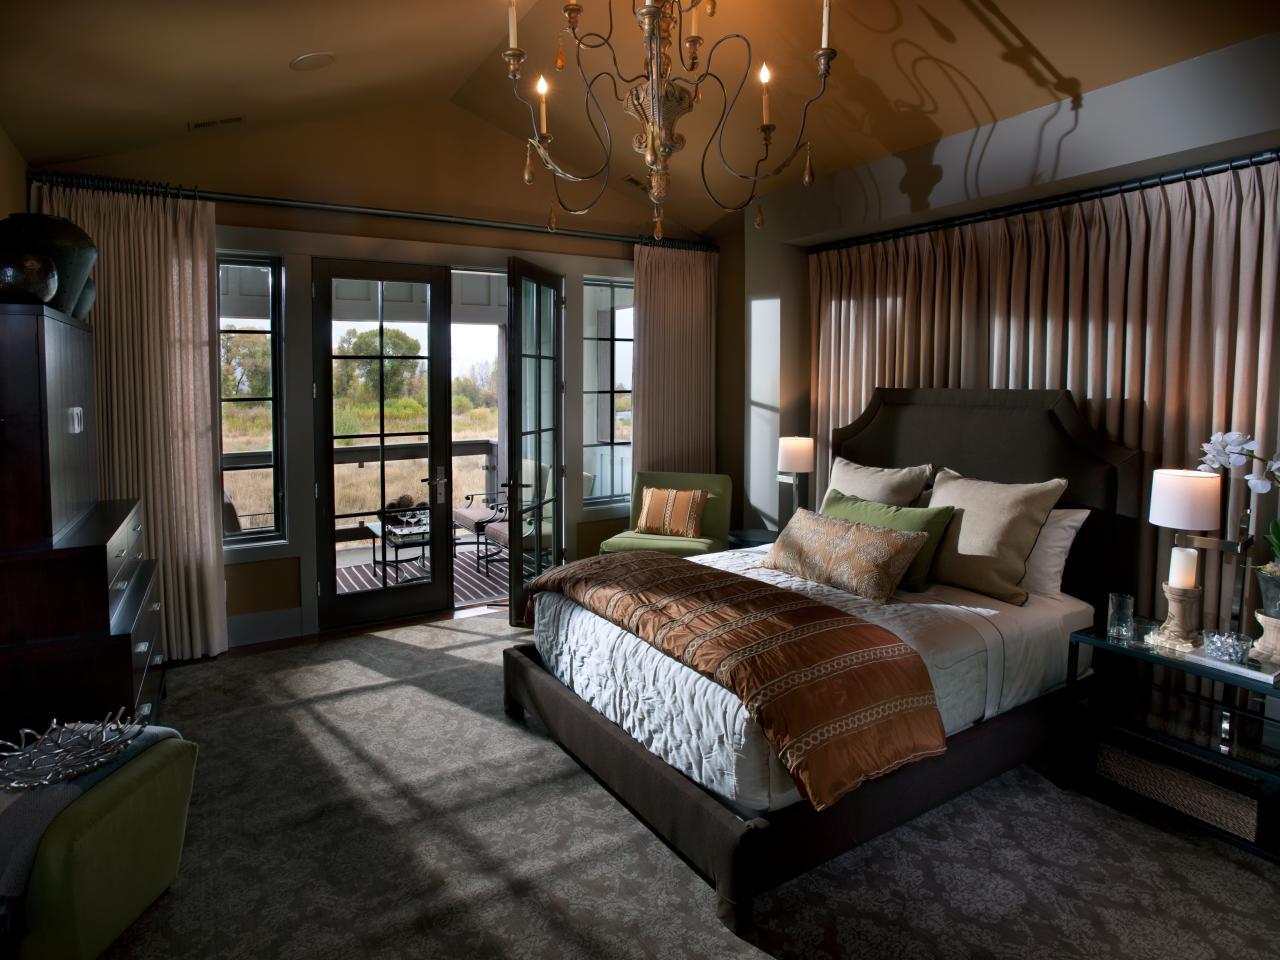 20 Incredible Master Bedrooms Design Ideas